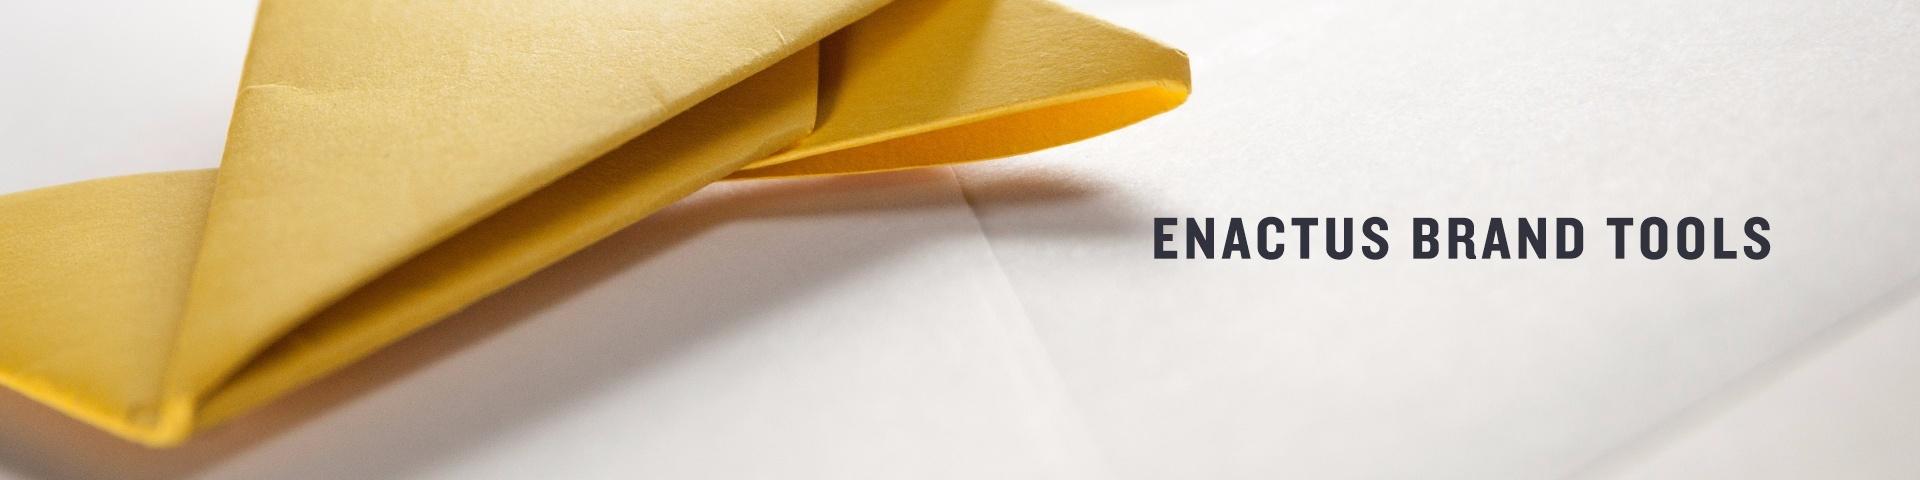 1. Enactus Brand Tools